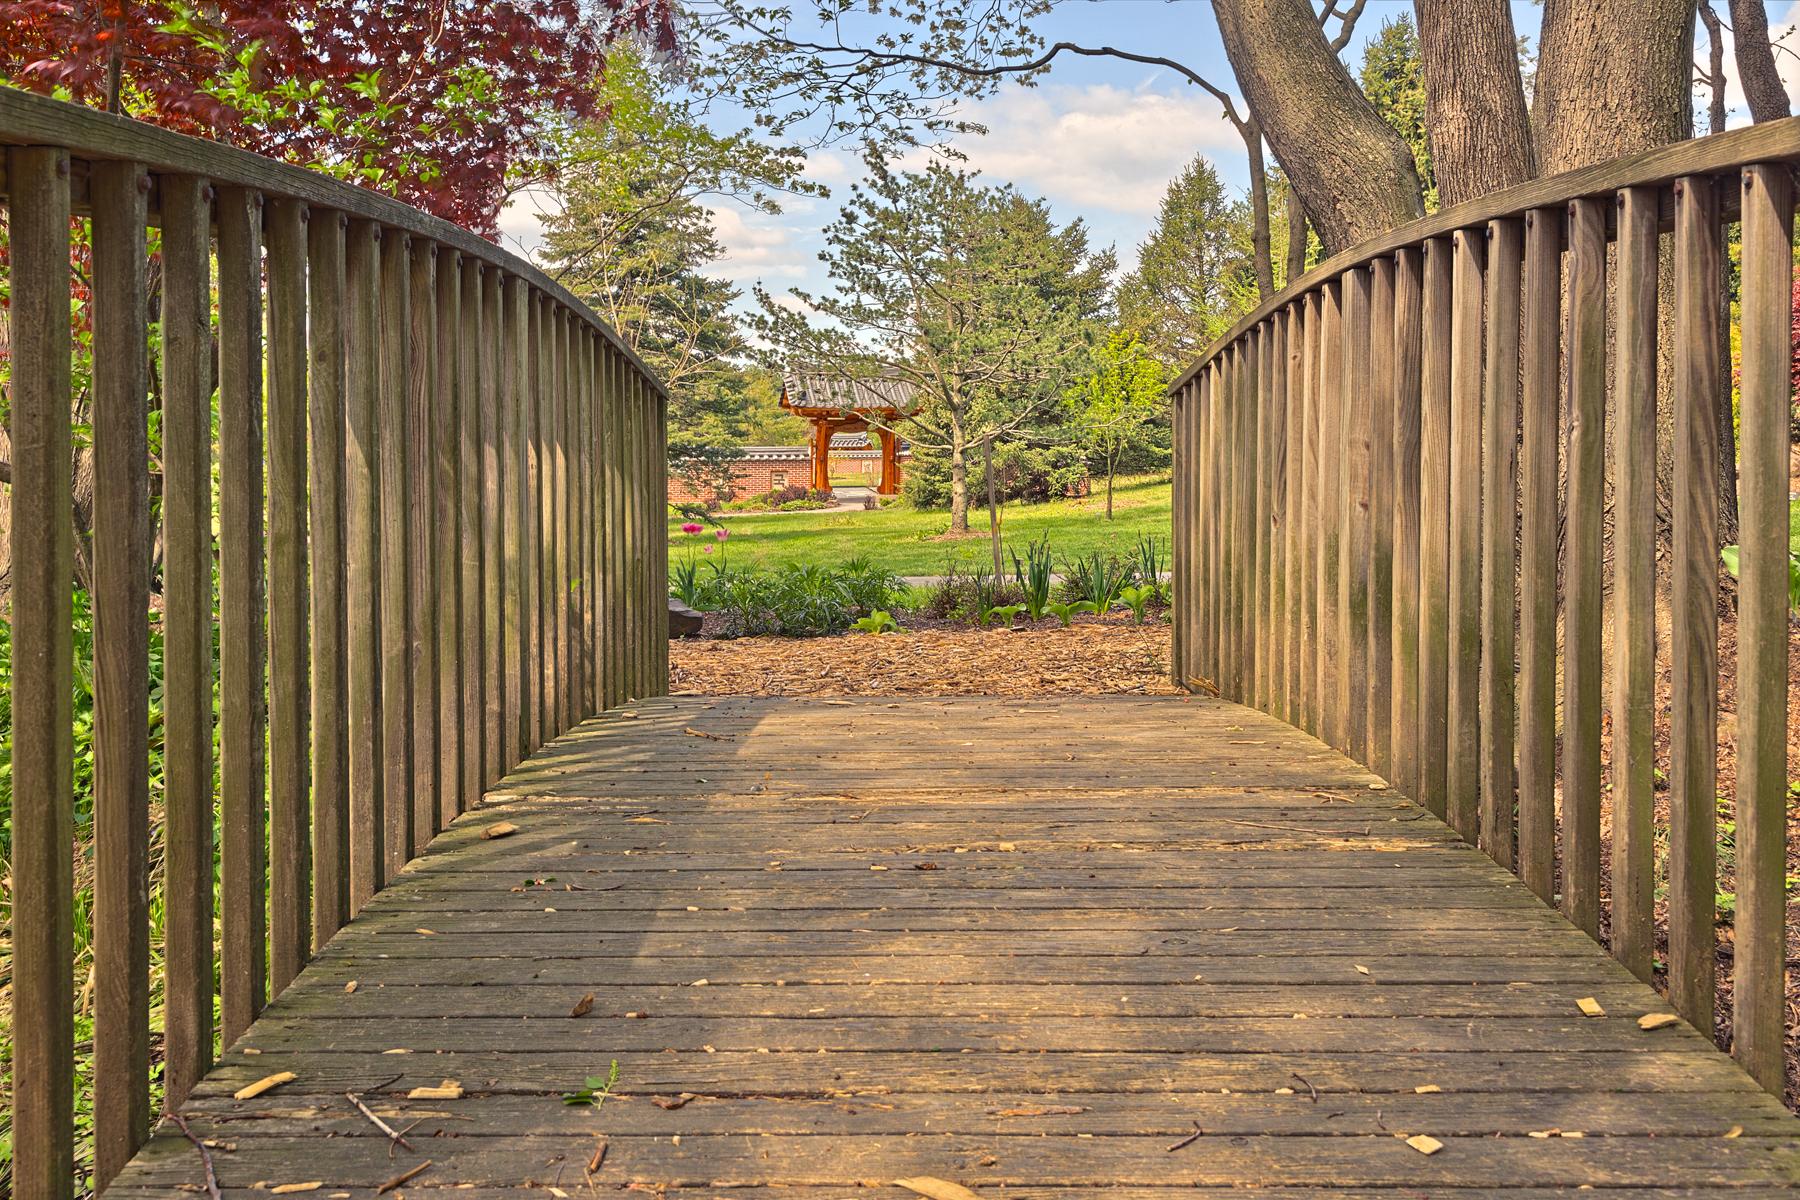 Meadowlark Gardens Bridge - HDR, America, Plant, Serene, Scenic, HQ Photo